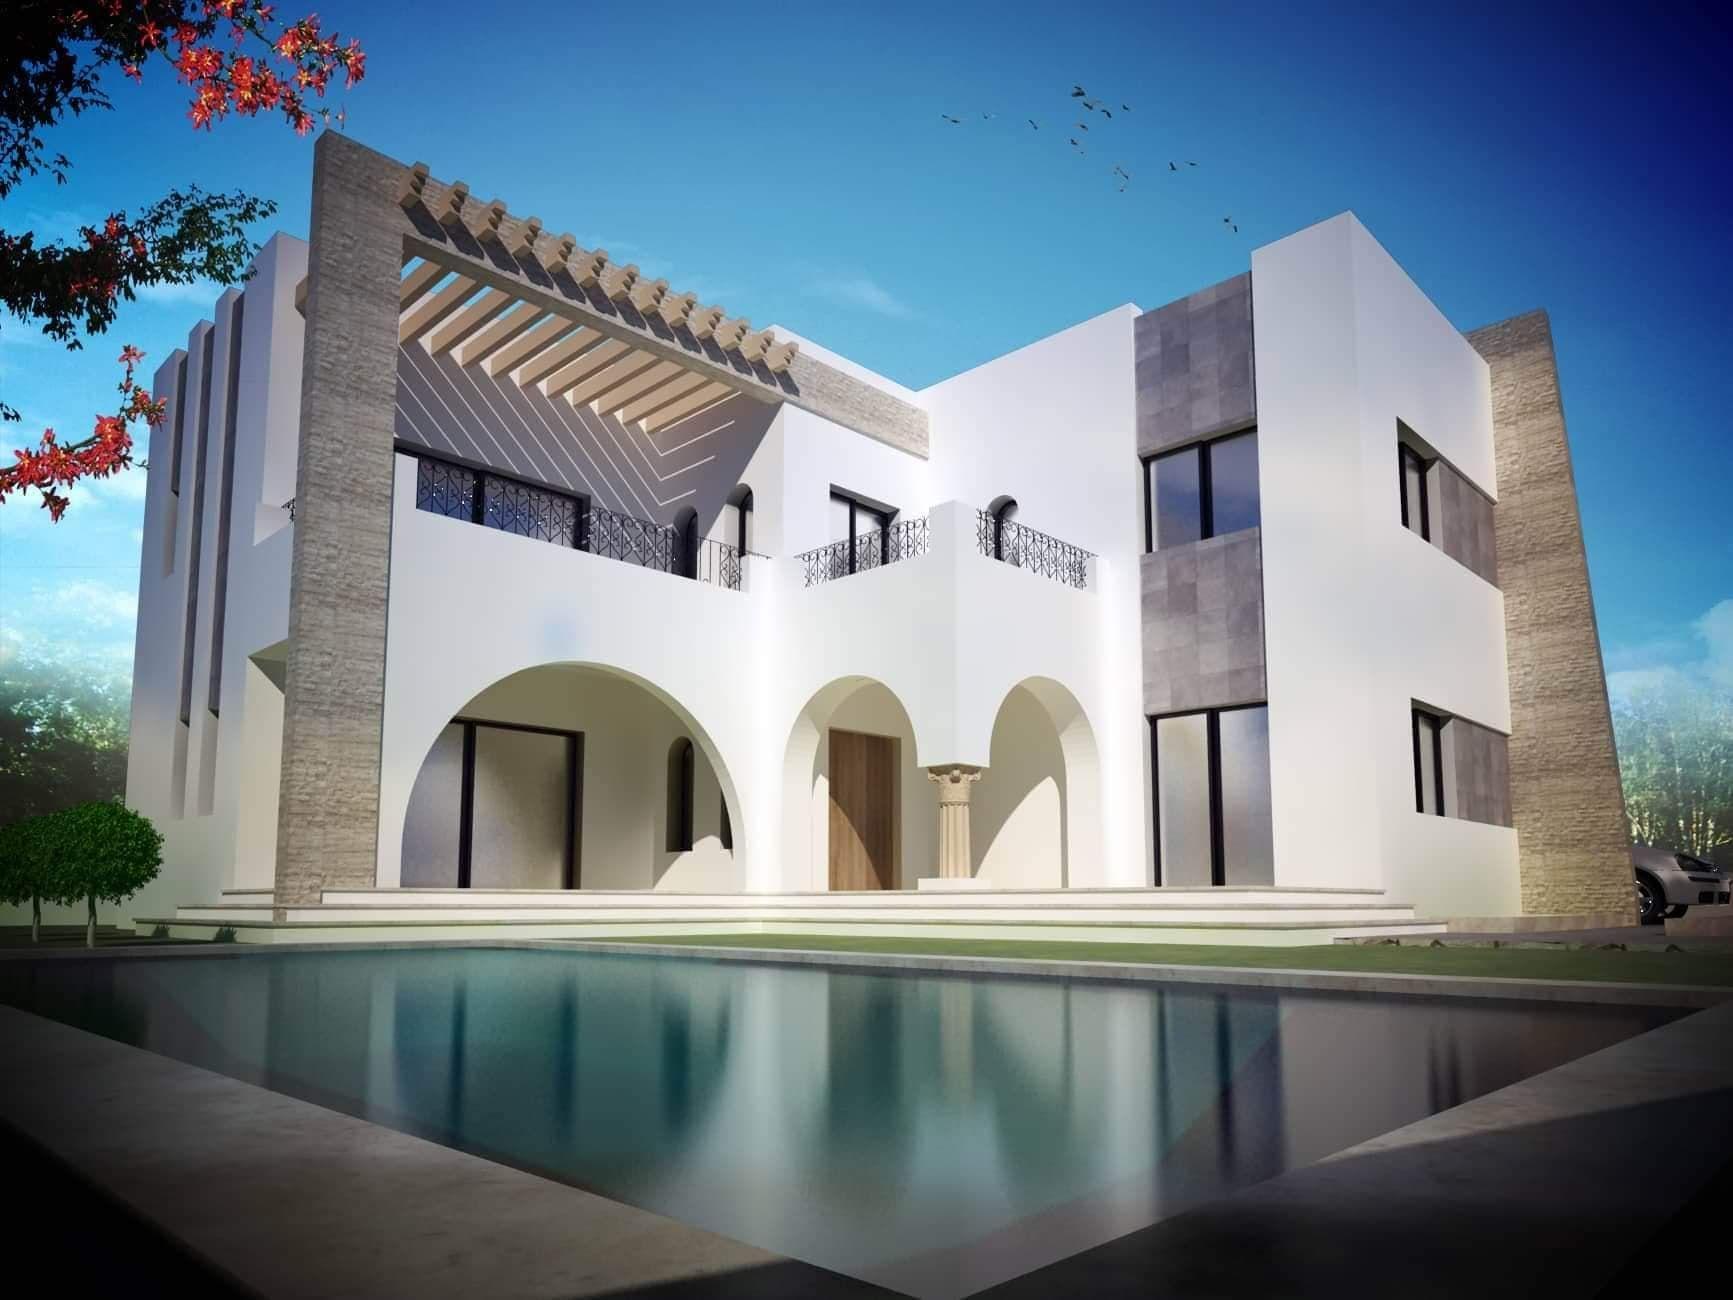 Villa brunella 2 réfere: villa brunella 2 réf: piscine